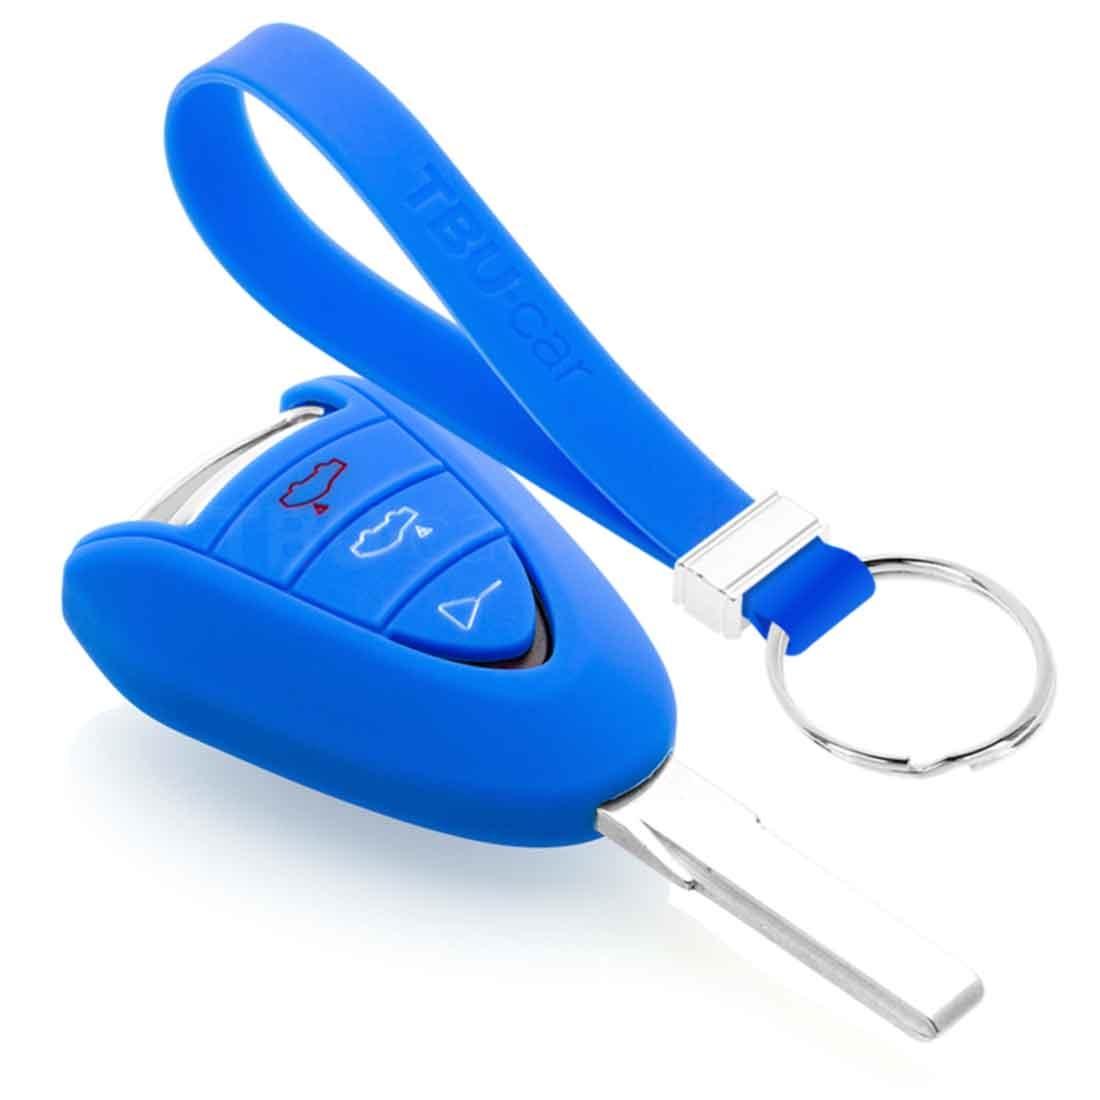 TBU car TBU car Autoschlüssel Hülle kompatibel mit Porsche 3 Tasten - Schutzhülle aus Silikon - Auto Schlüsselhülle Cover in Blau